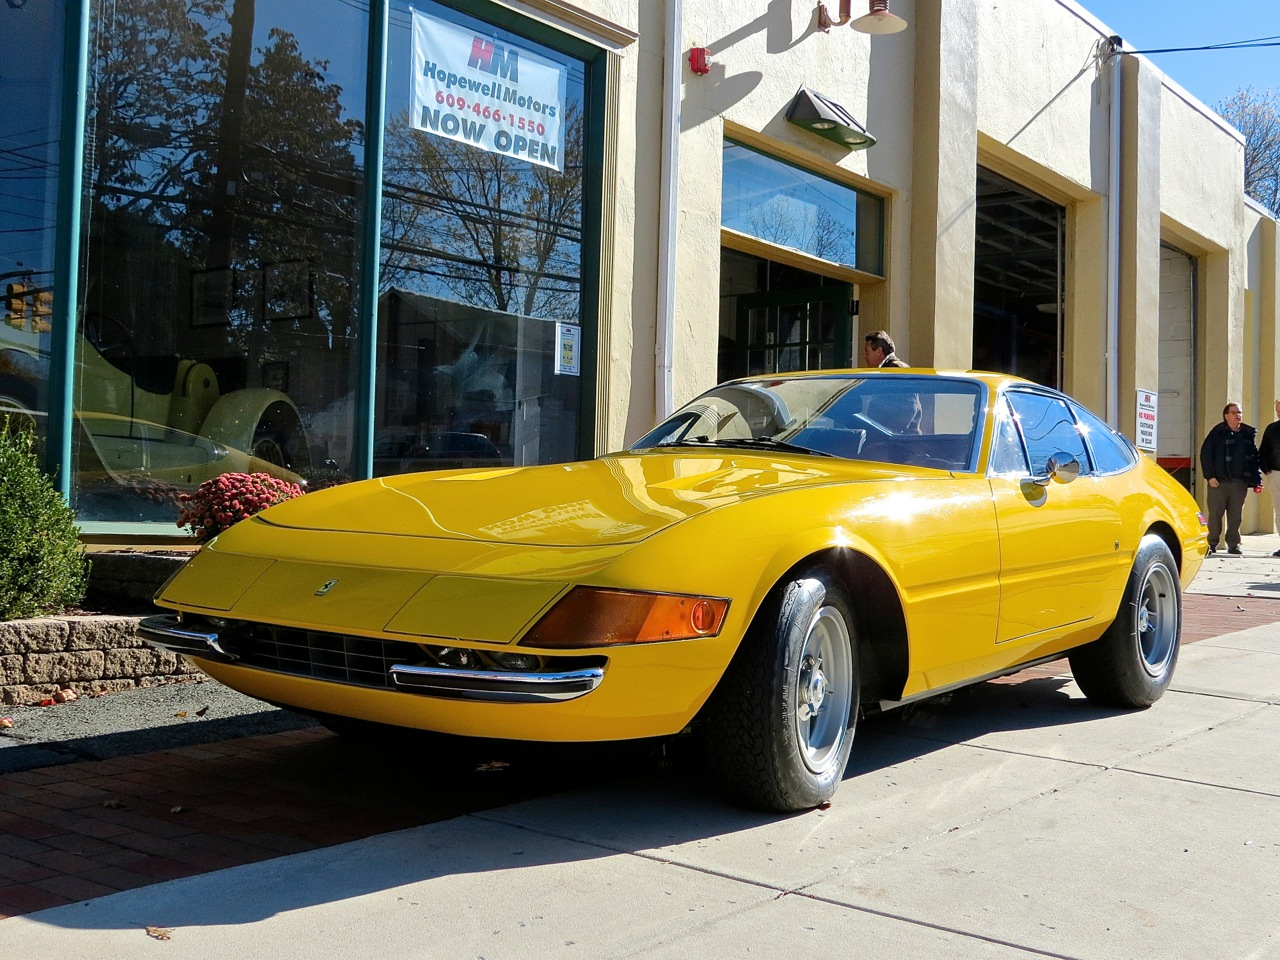 Ferrari 365 GTB-4 Daytona Hopewell NJ 4